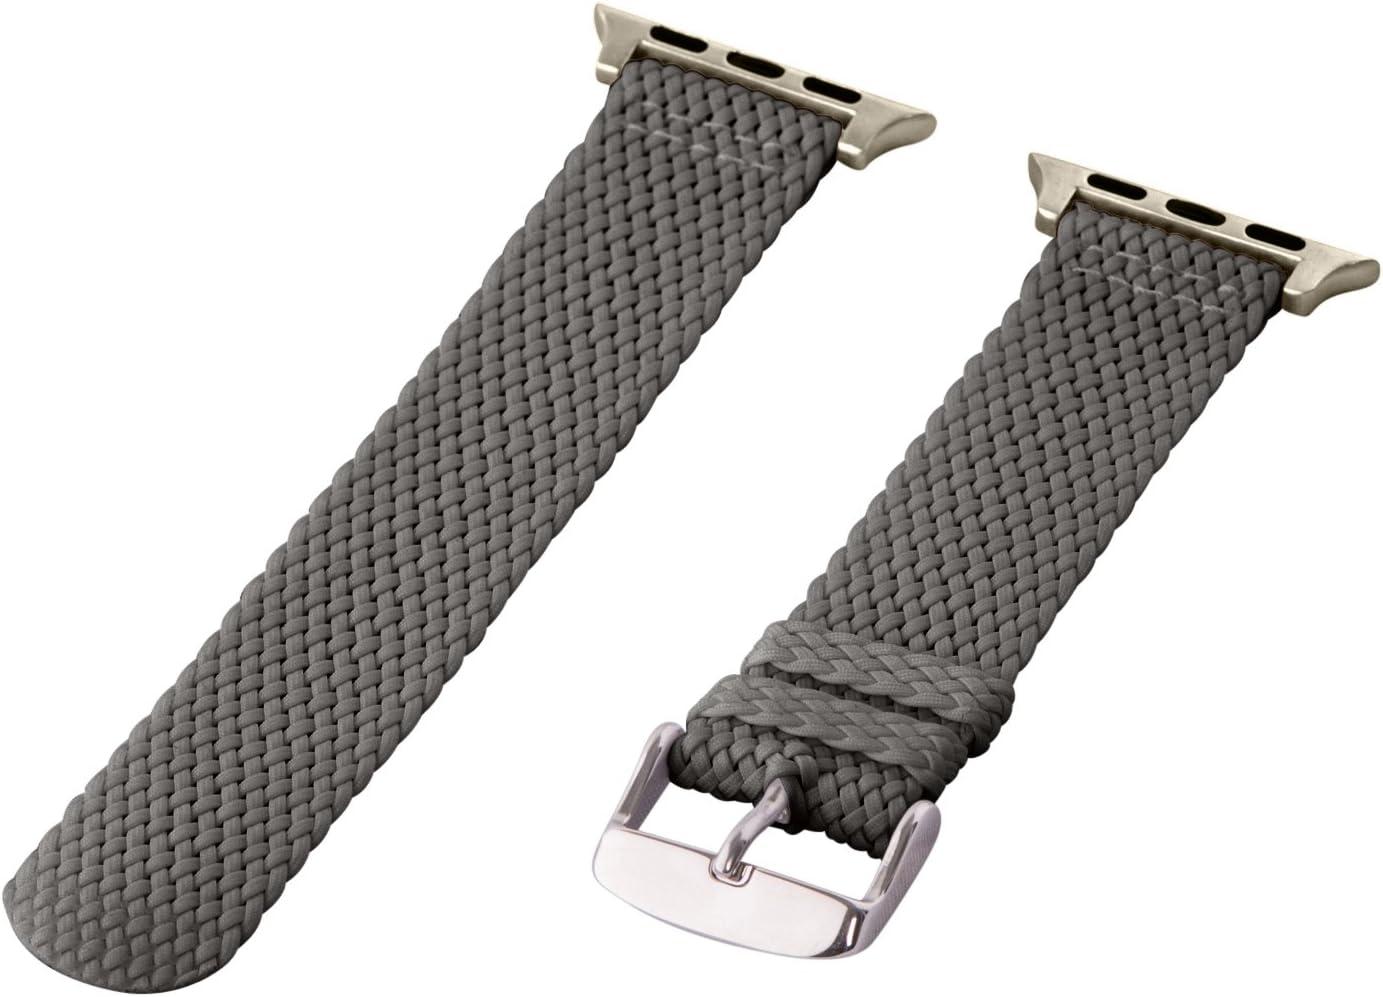 Clockwork Synergy - 2 Piece Perlon Braided Nylon Bands for Apple Watch (38mm Dark Grey)